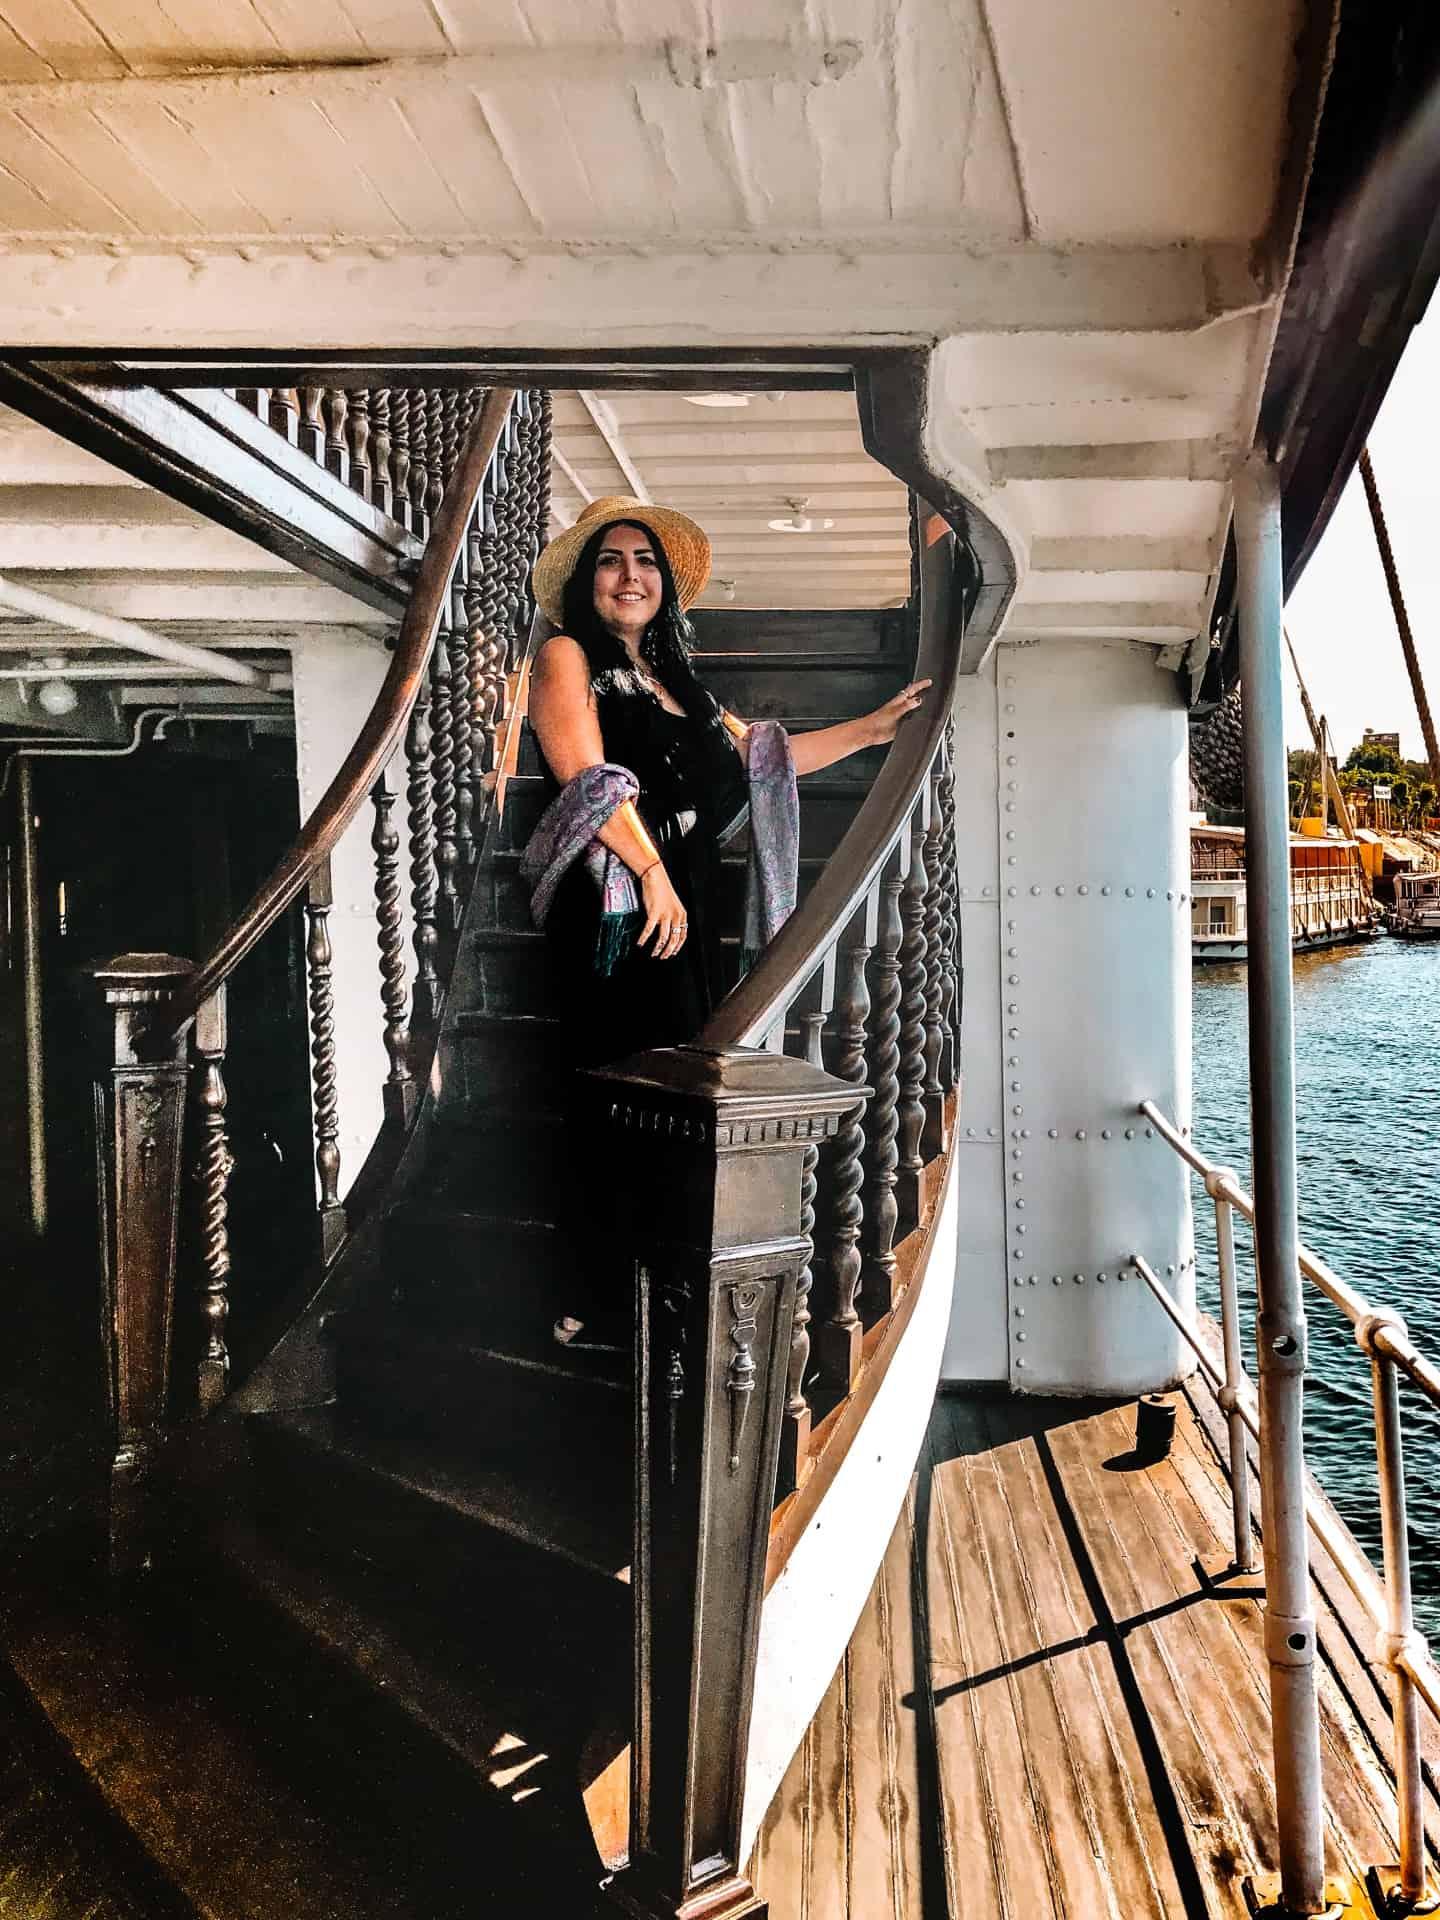 agatha christie nile cruise steam ship sudan death on the nile